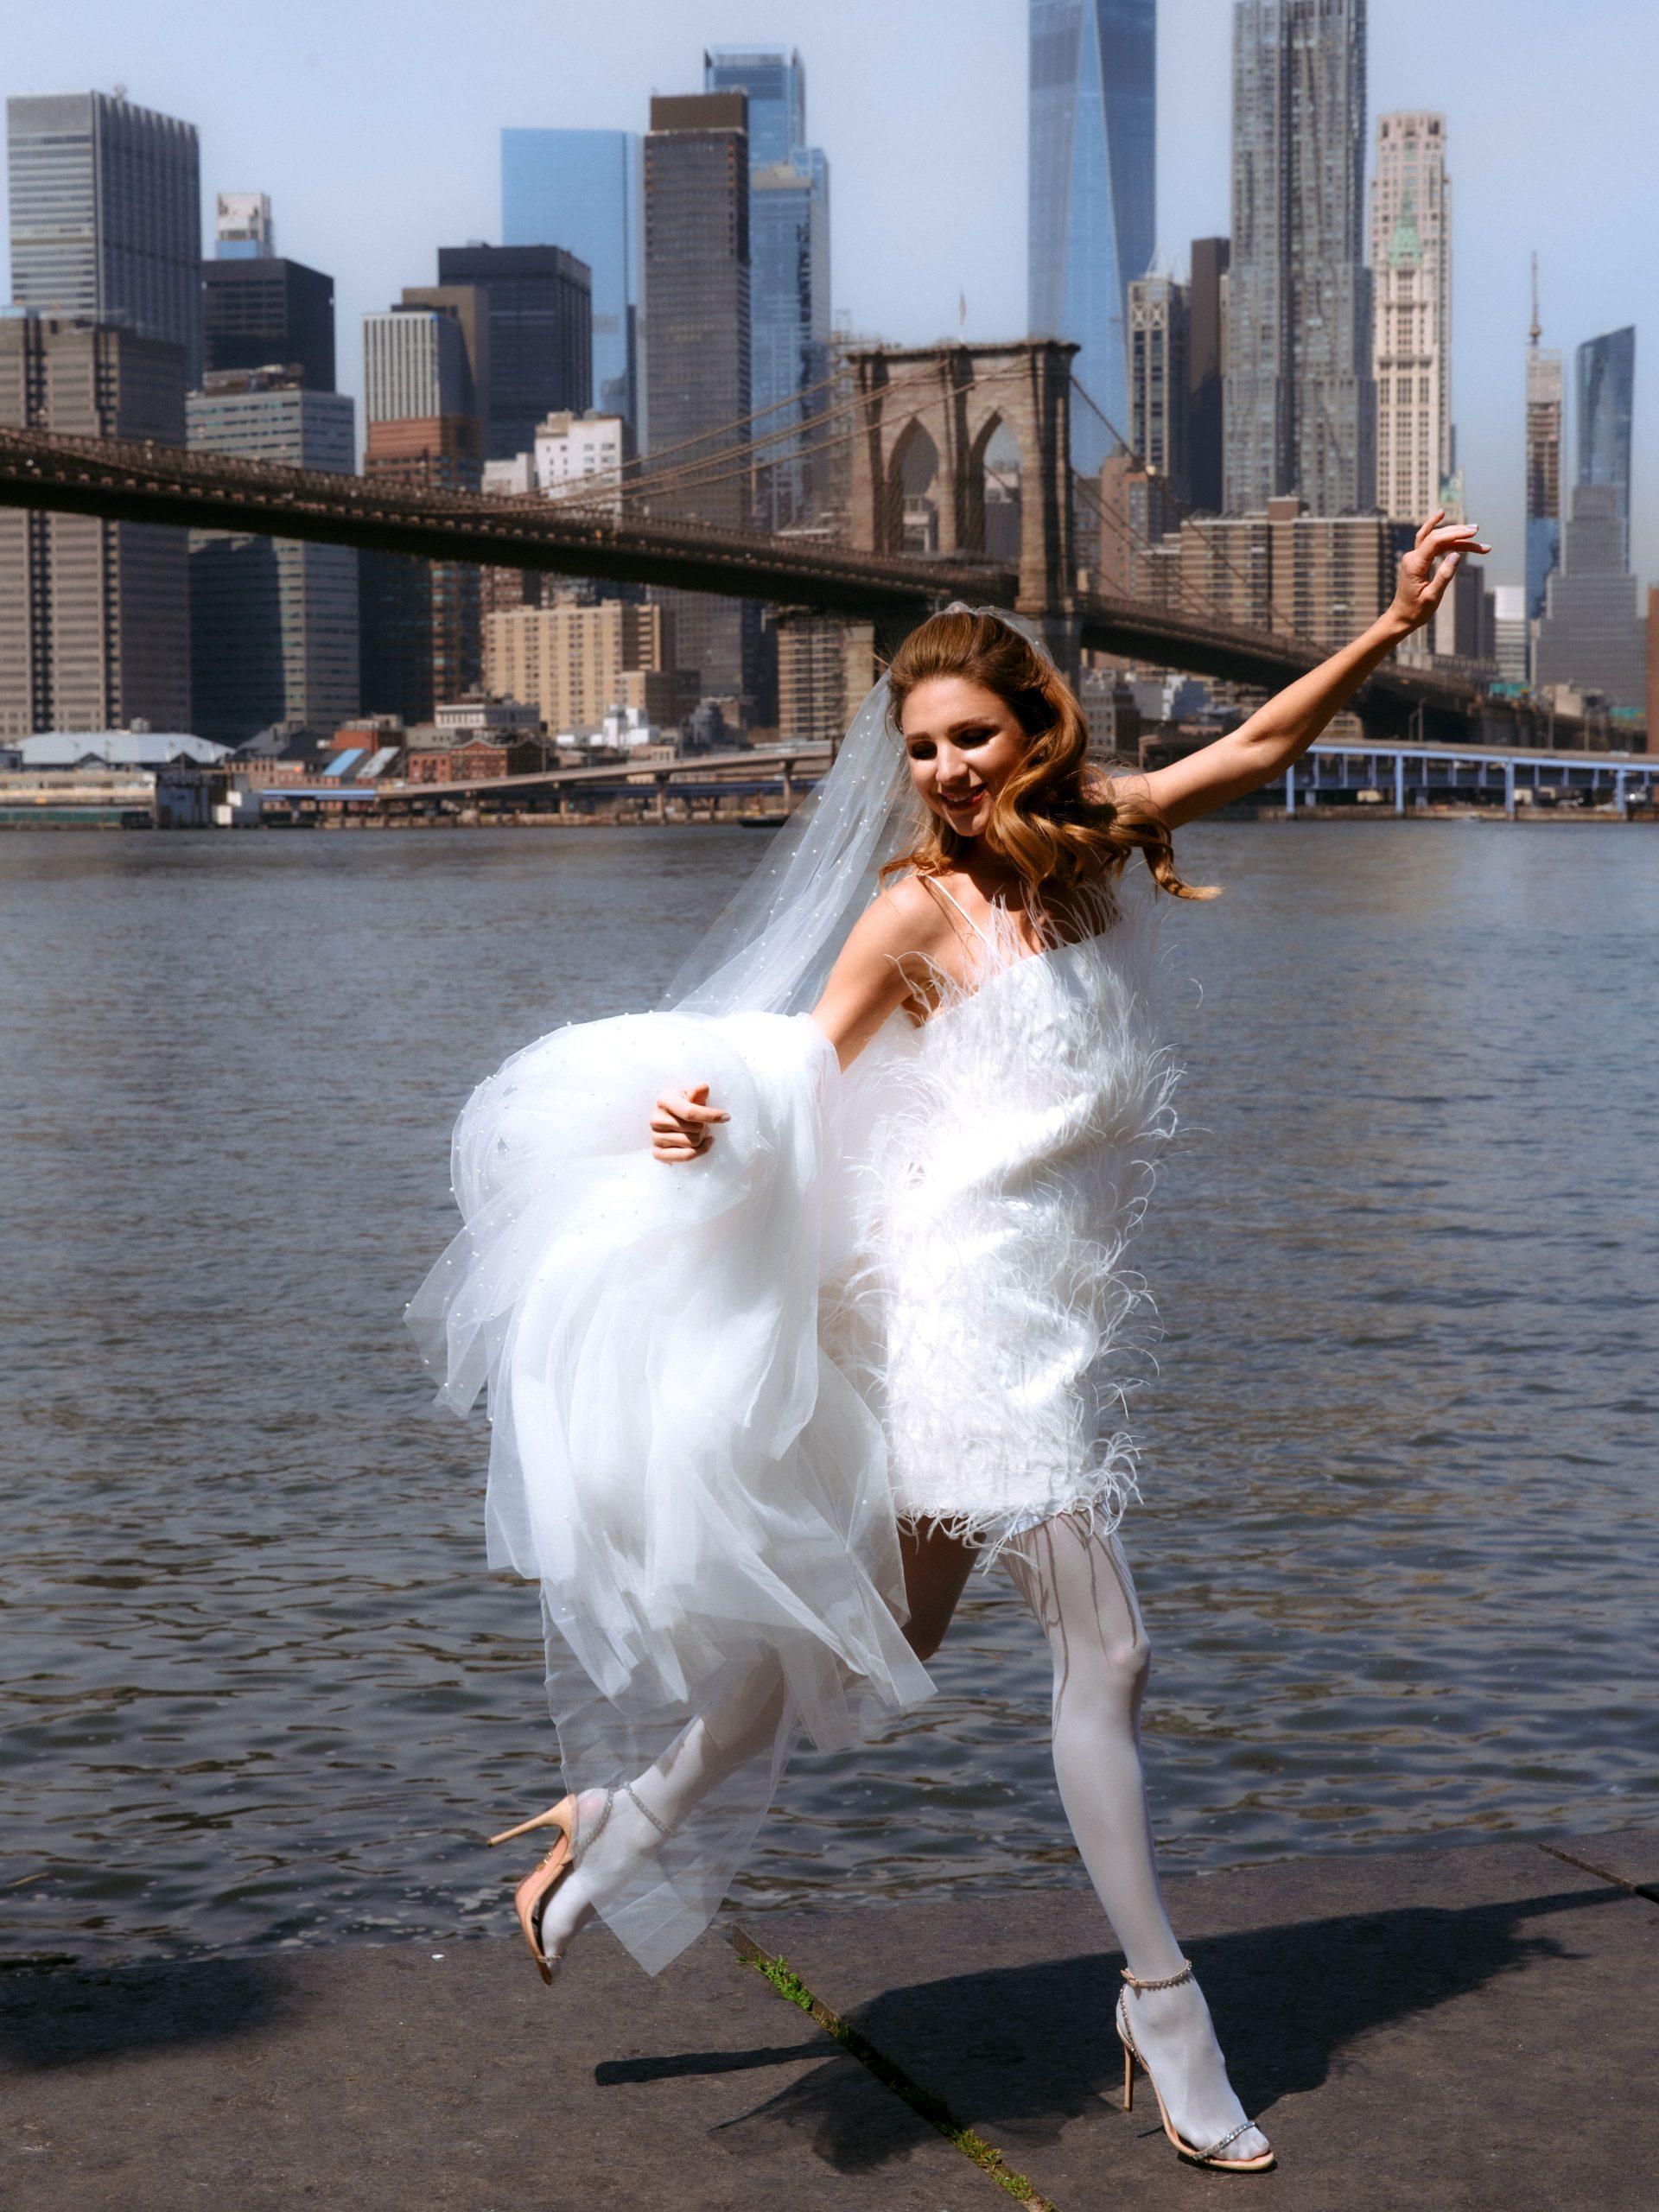 Кадры из Нью-Йорка: свадебная коллекция Wona & the Coat by Katya Silchenko